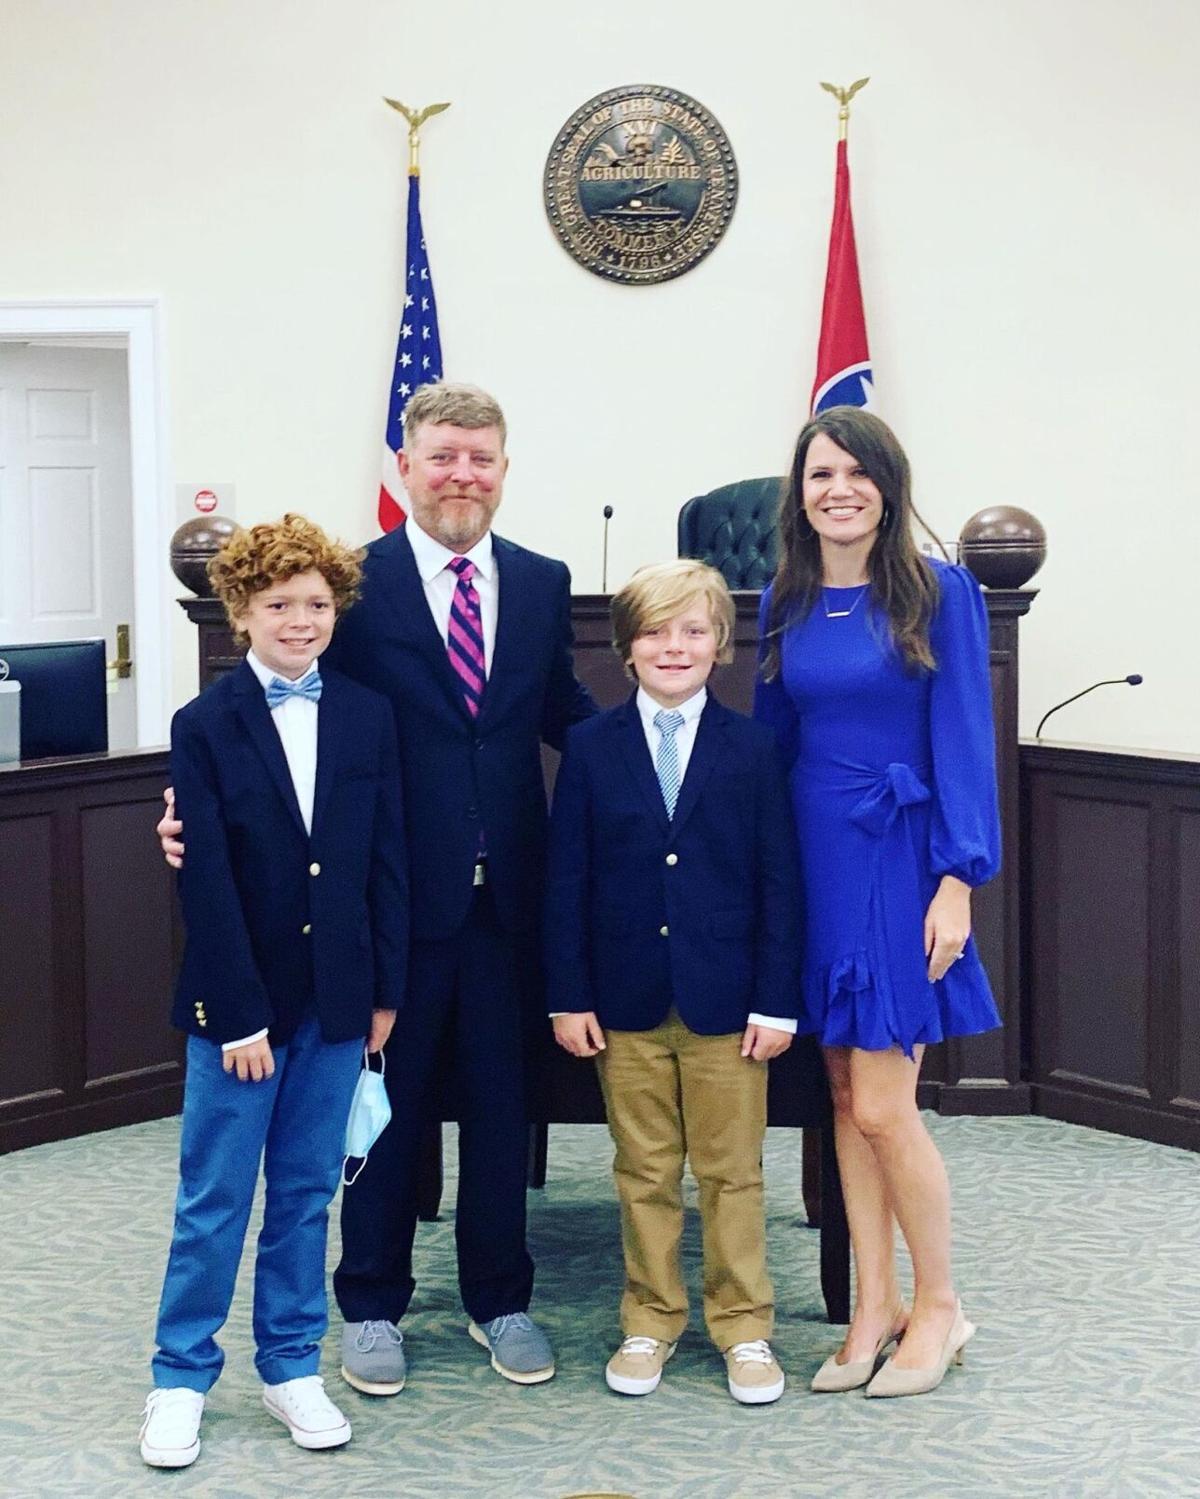 Third Judicial District Circuit Judge William Phillips and family